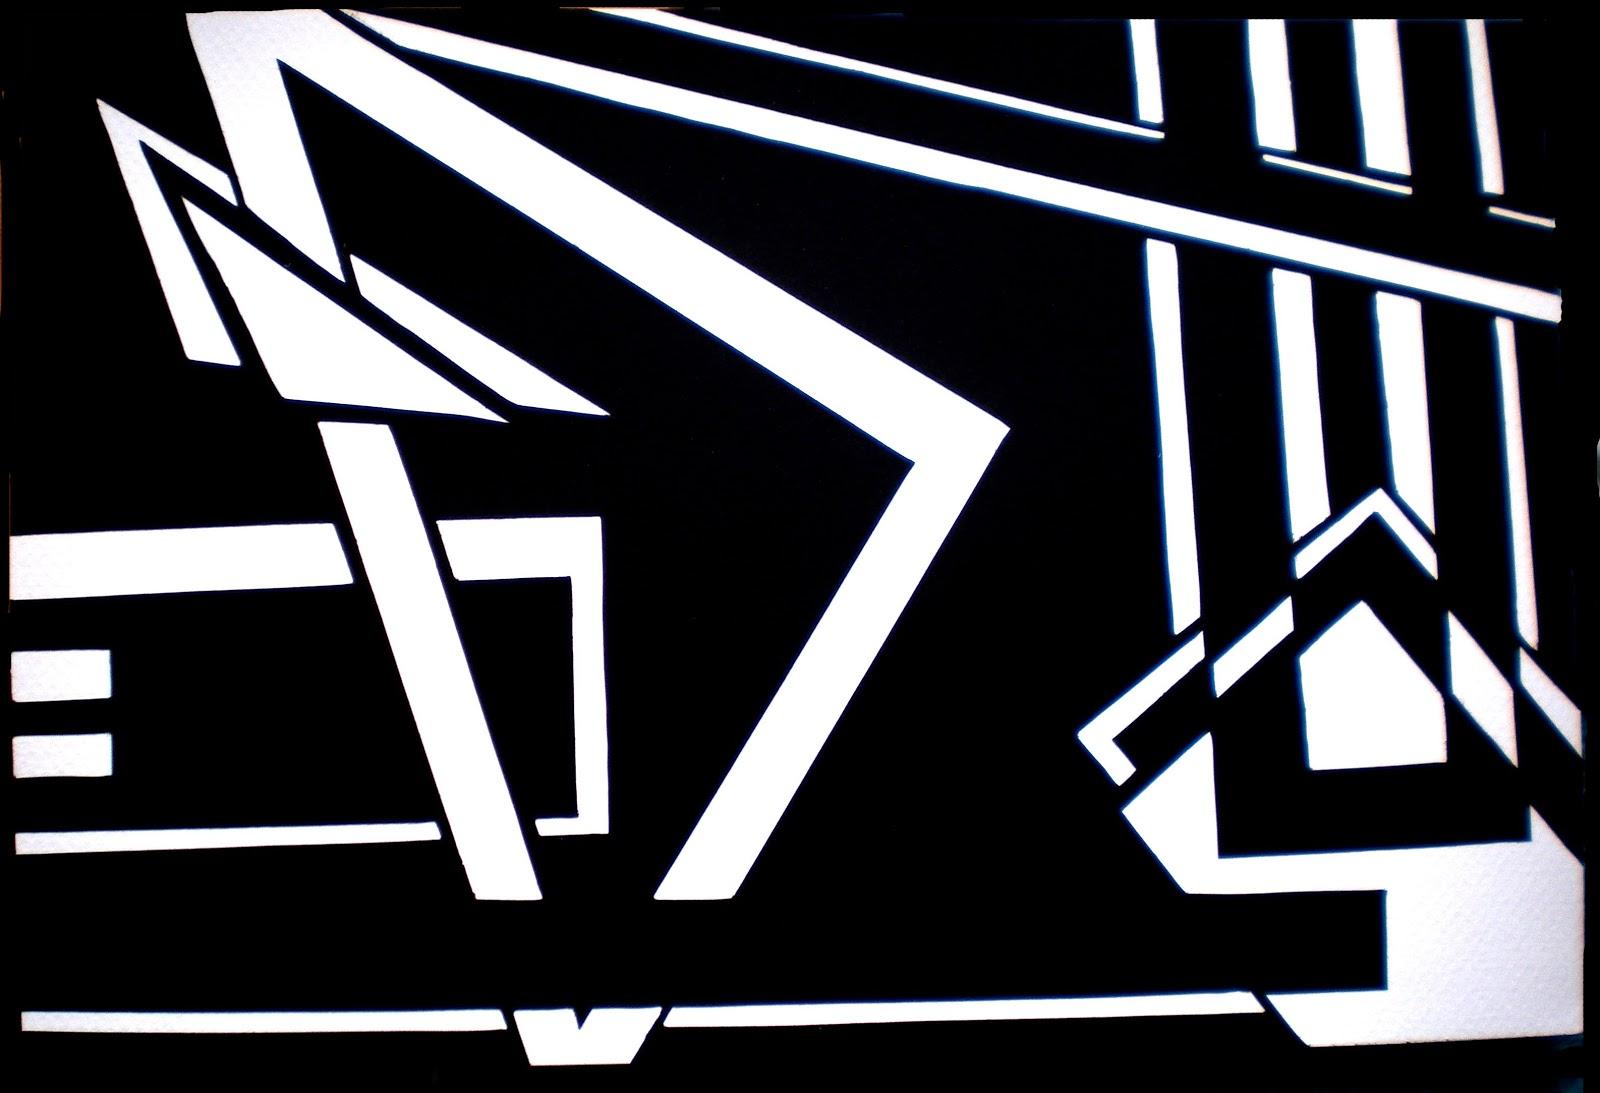 Ariel Mckay S Work Two Dimensional Design,Sports Team Logo Design Free